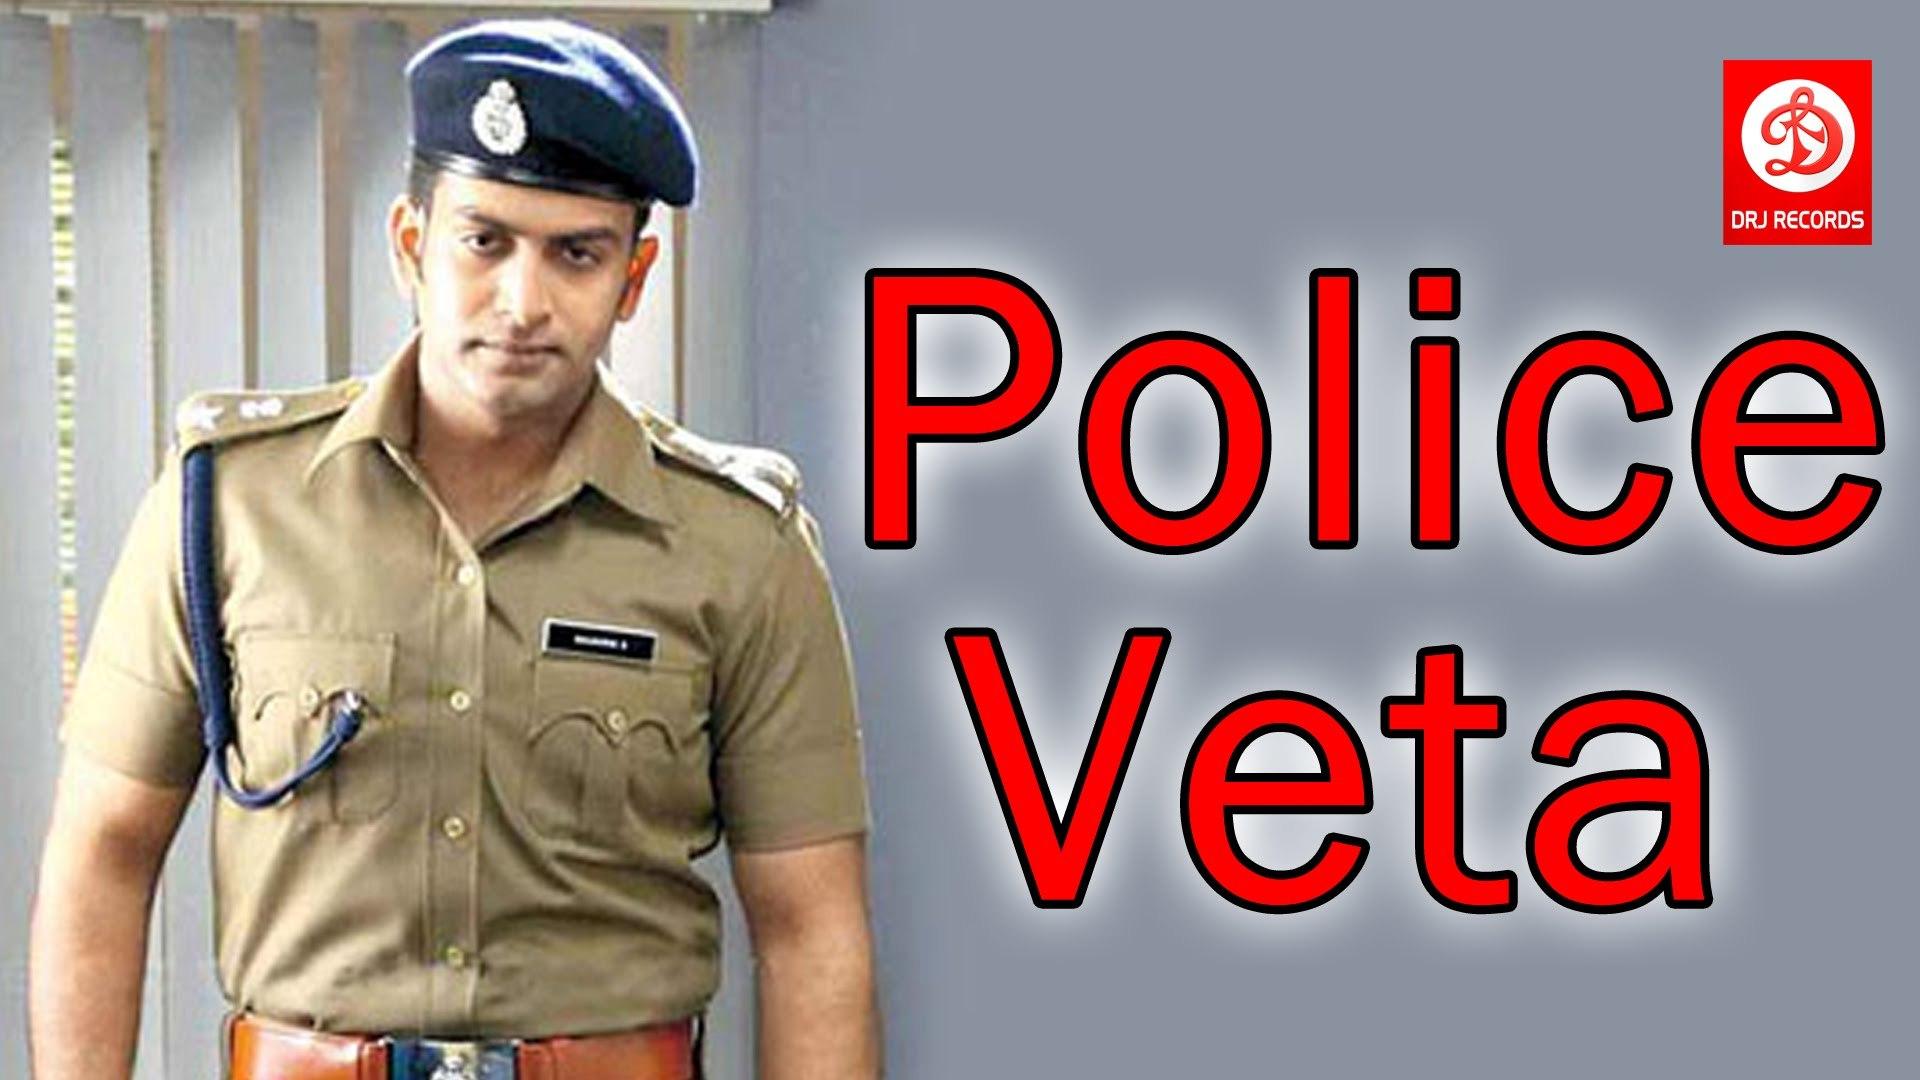 Police Veta || Telugu Full Movie || Action Thriller Movie || Prithviraj, Mallika Kapoor